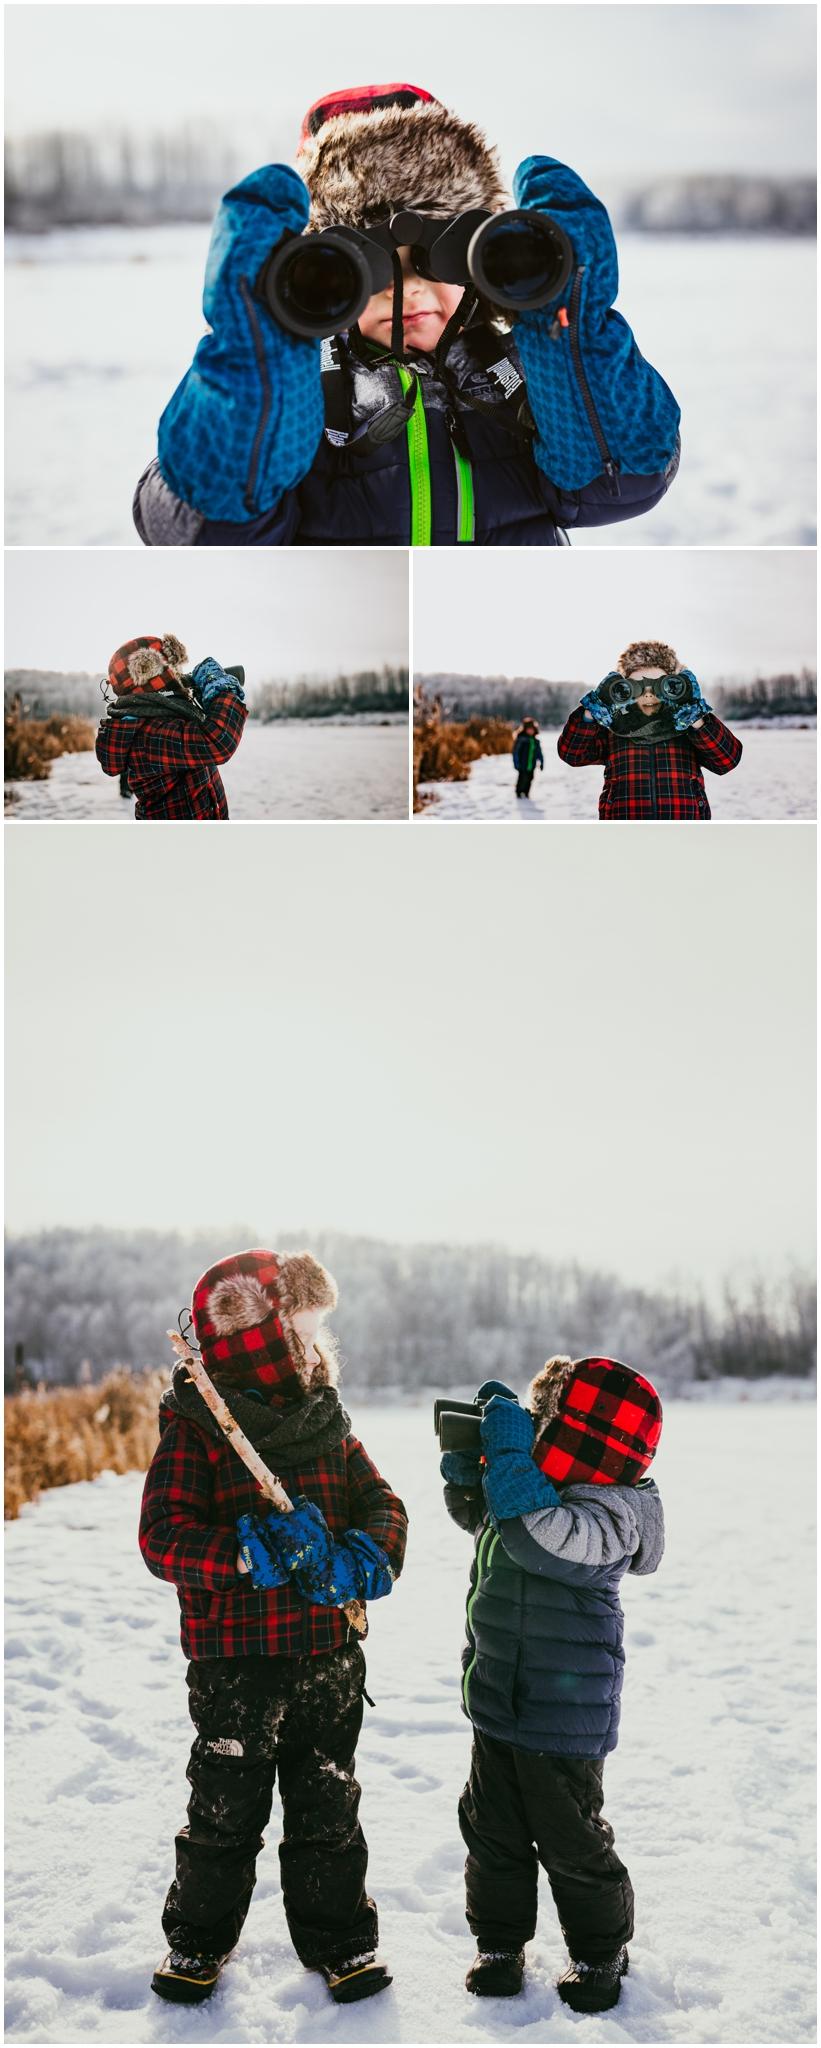 Edmonton Photographer - Family Photographer Lifestyle Documentary Edmonton - Alberta Winter Lakes - Kids binoculars.jpg